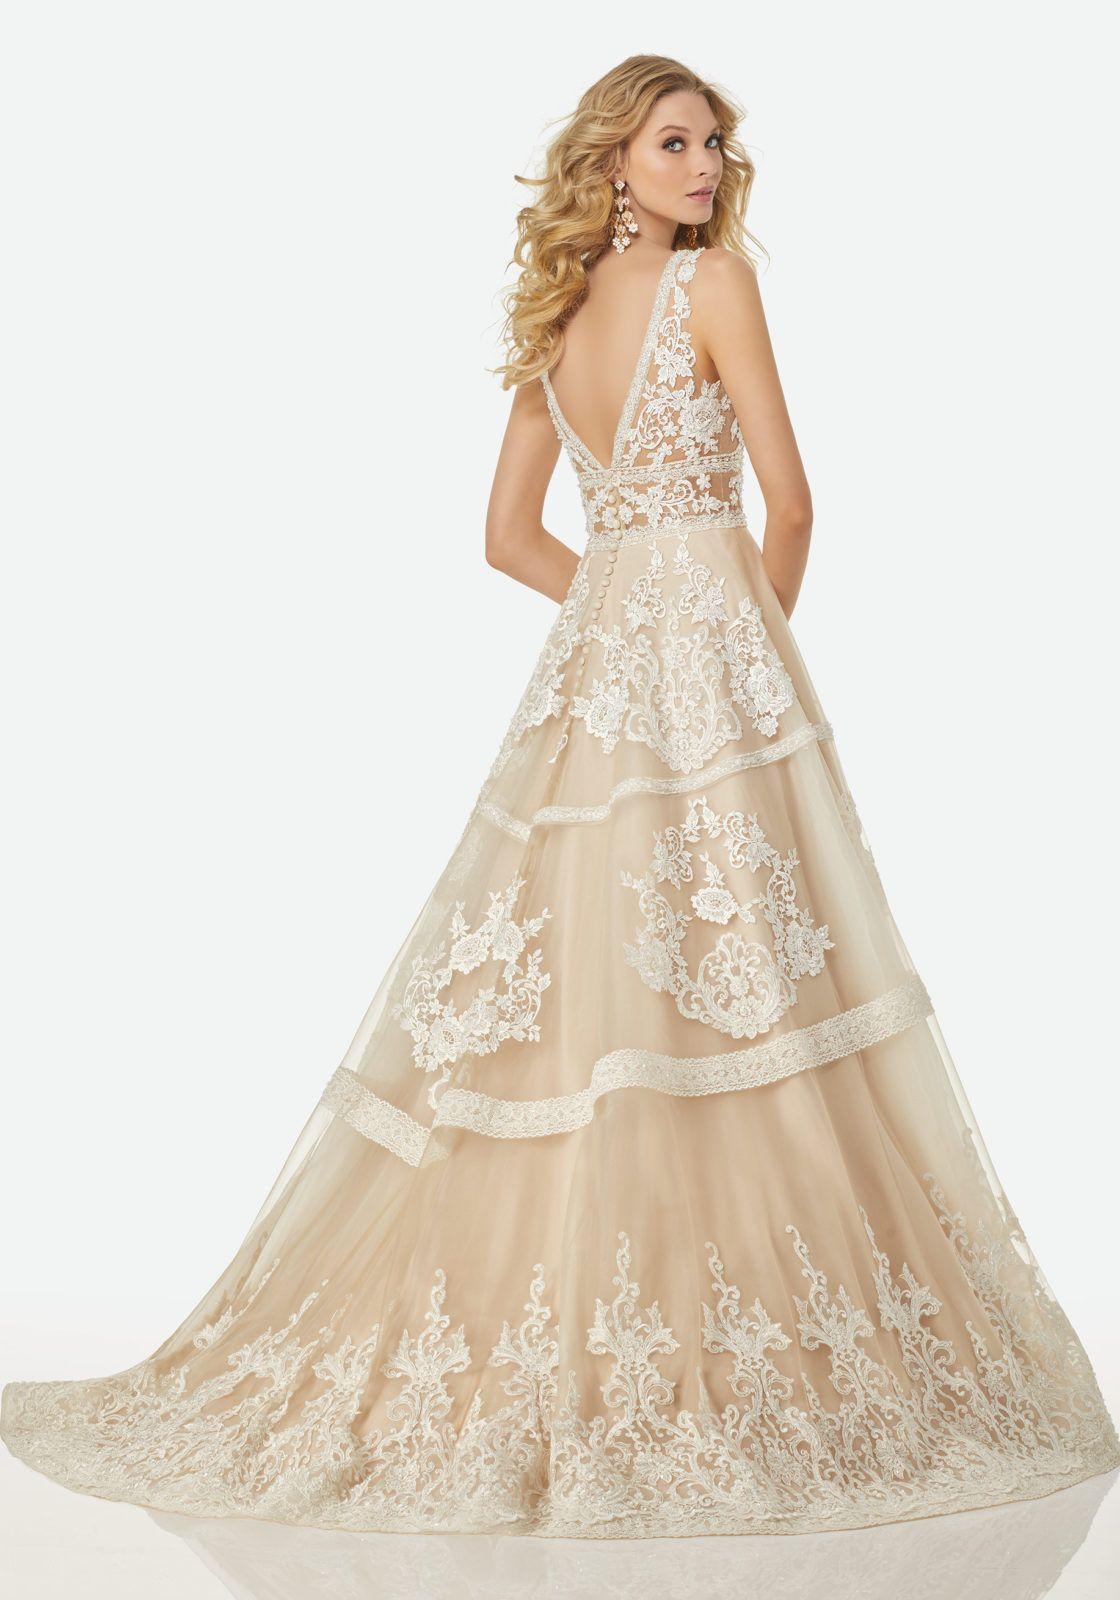 Michelle Randy wedding dresses, Wedding dresses, Aline